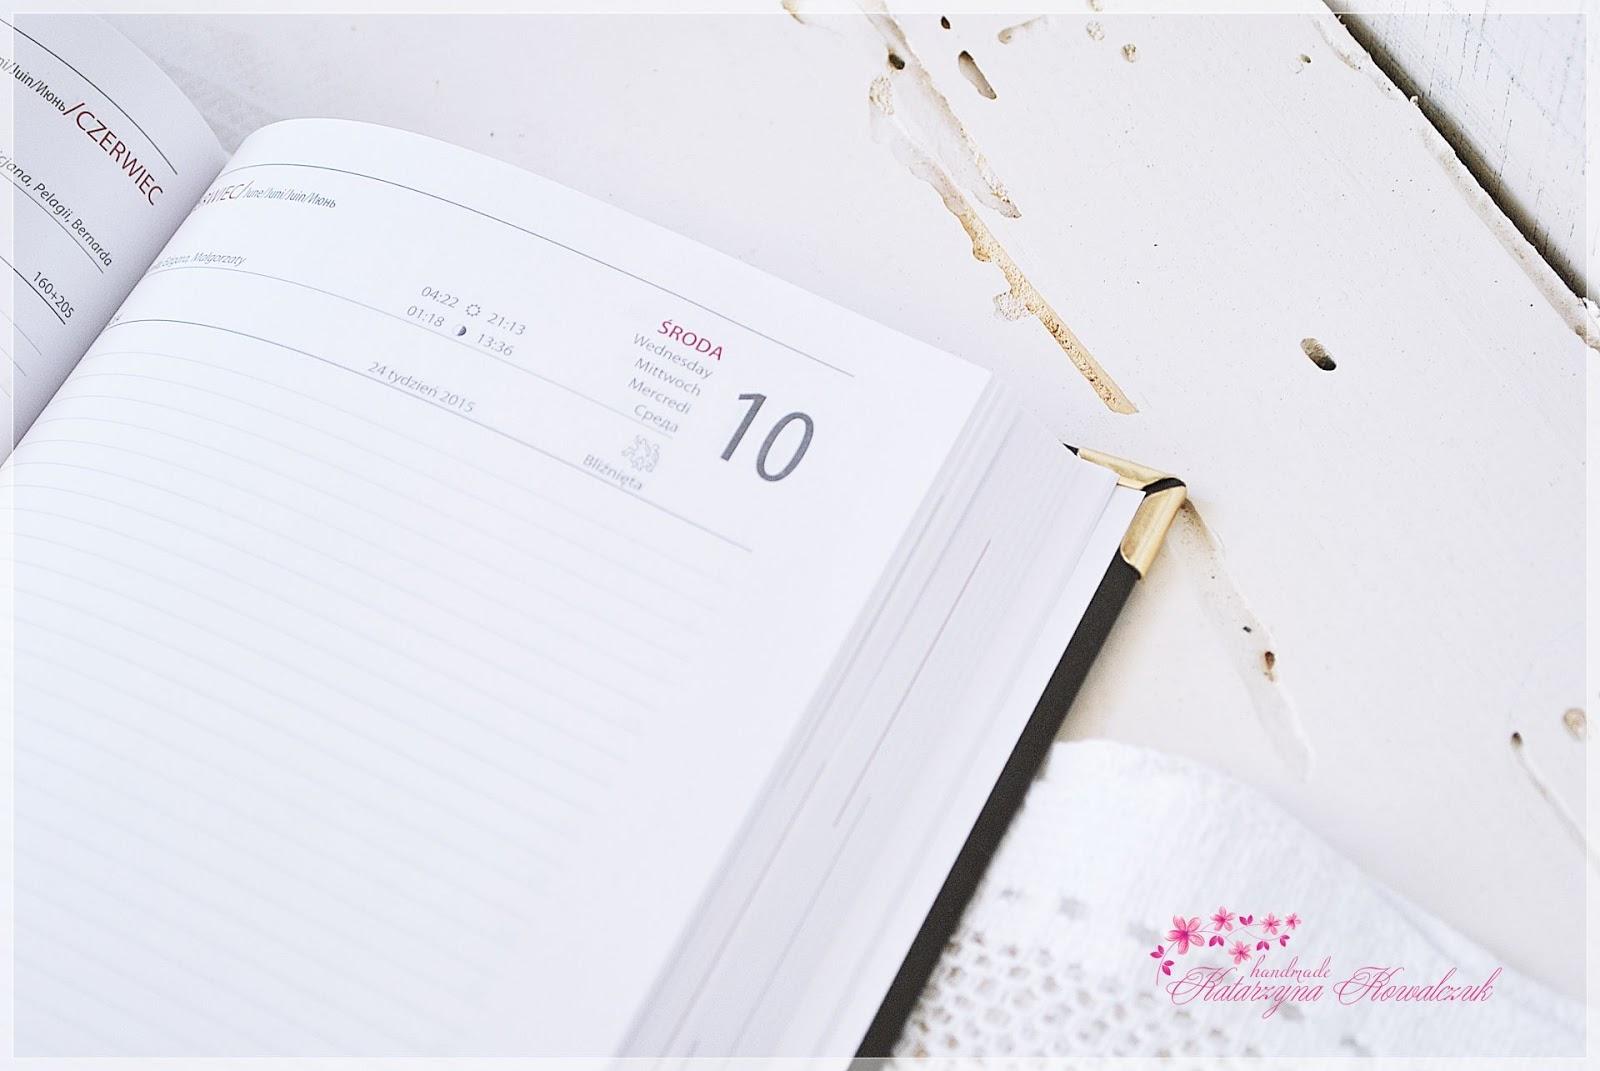 Kalendarz na 2015 rok scrapbooking